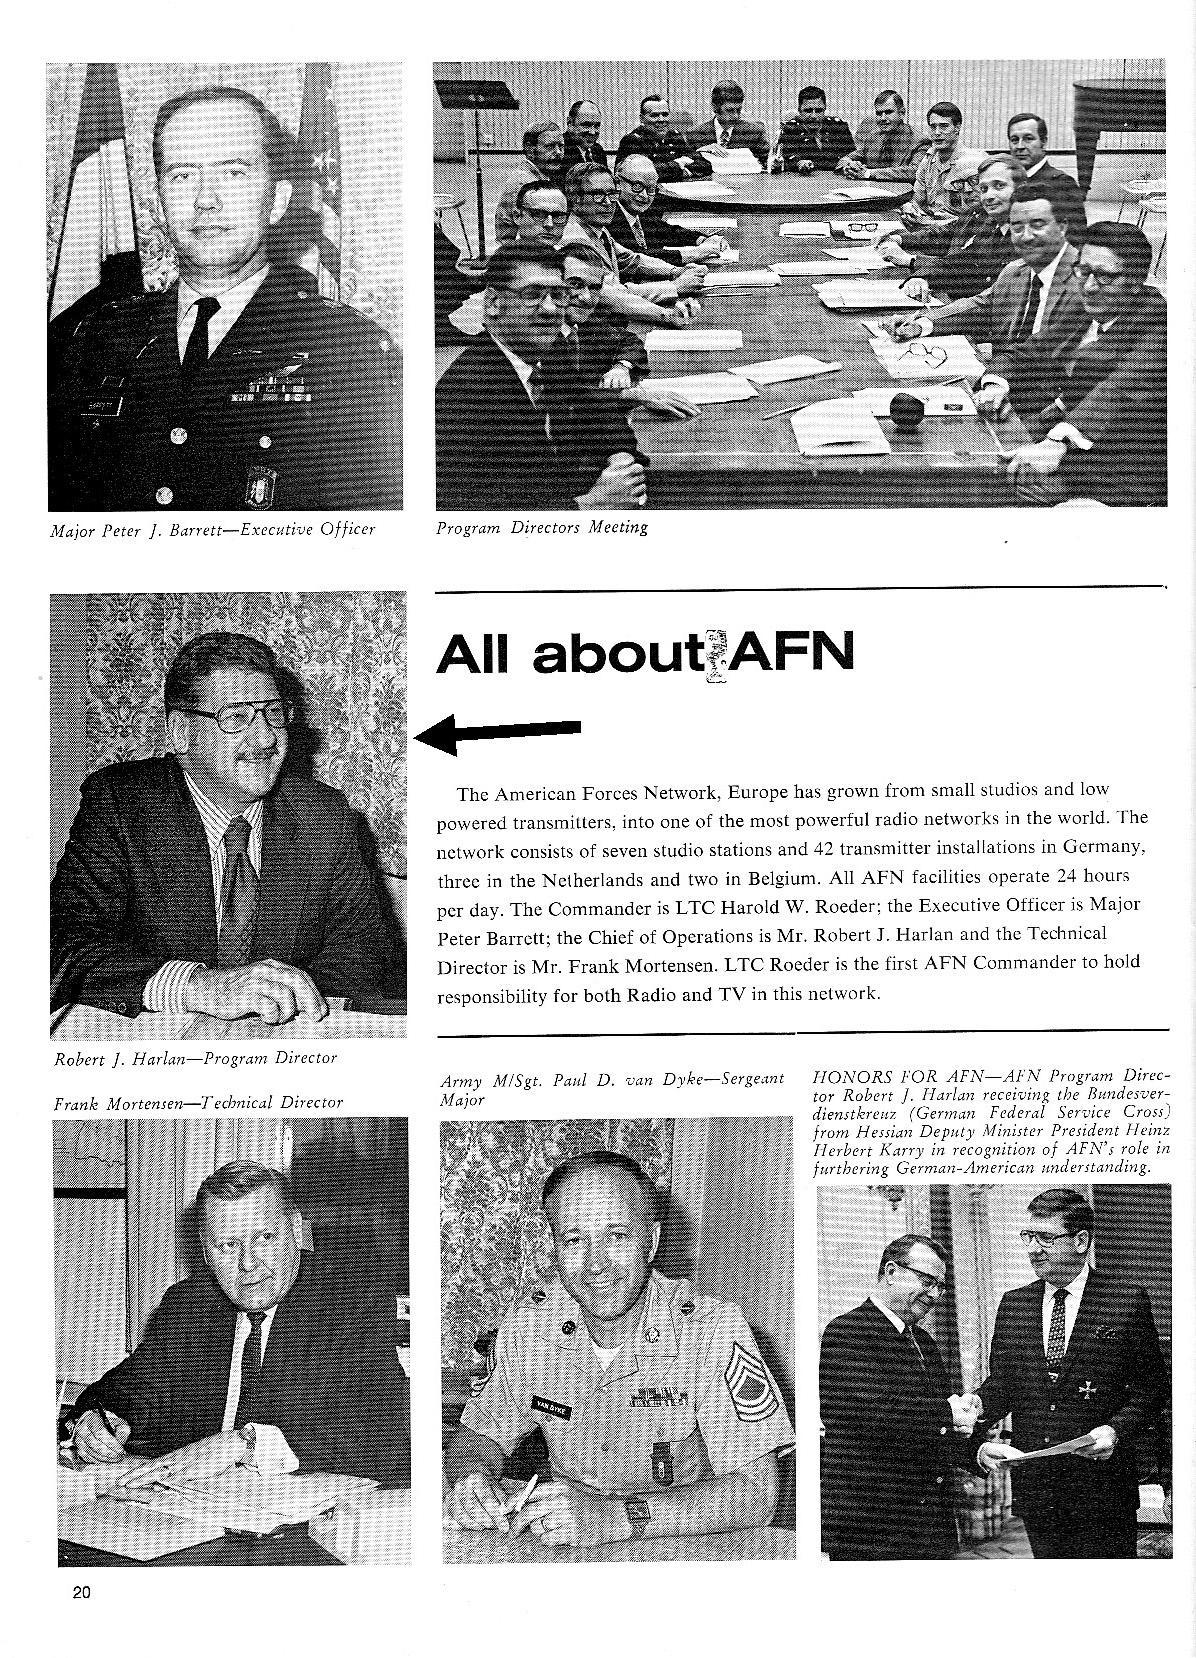 1973 AFN 30 jaar boekje-9.jpg